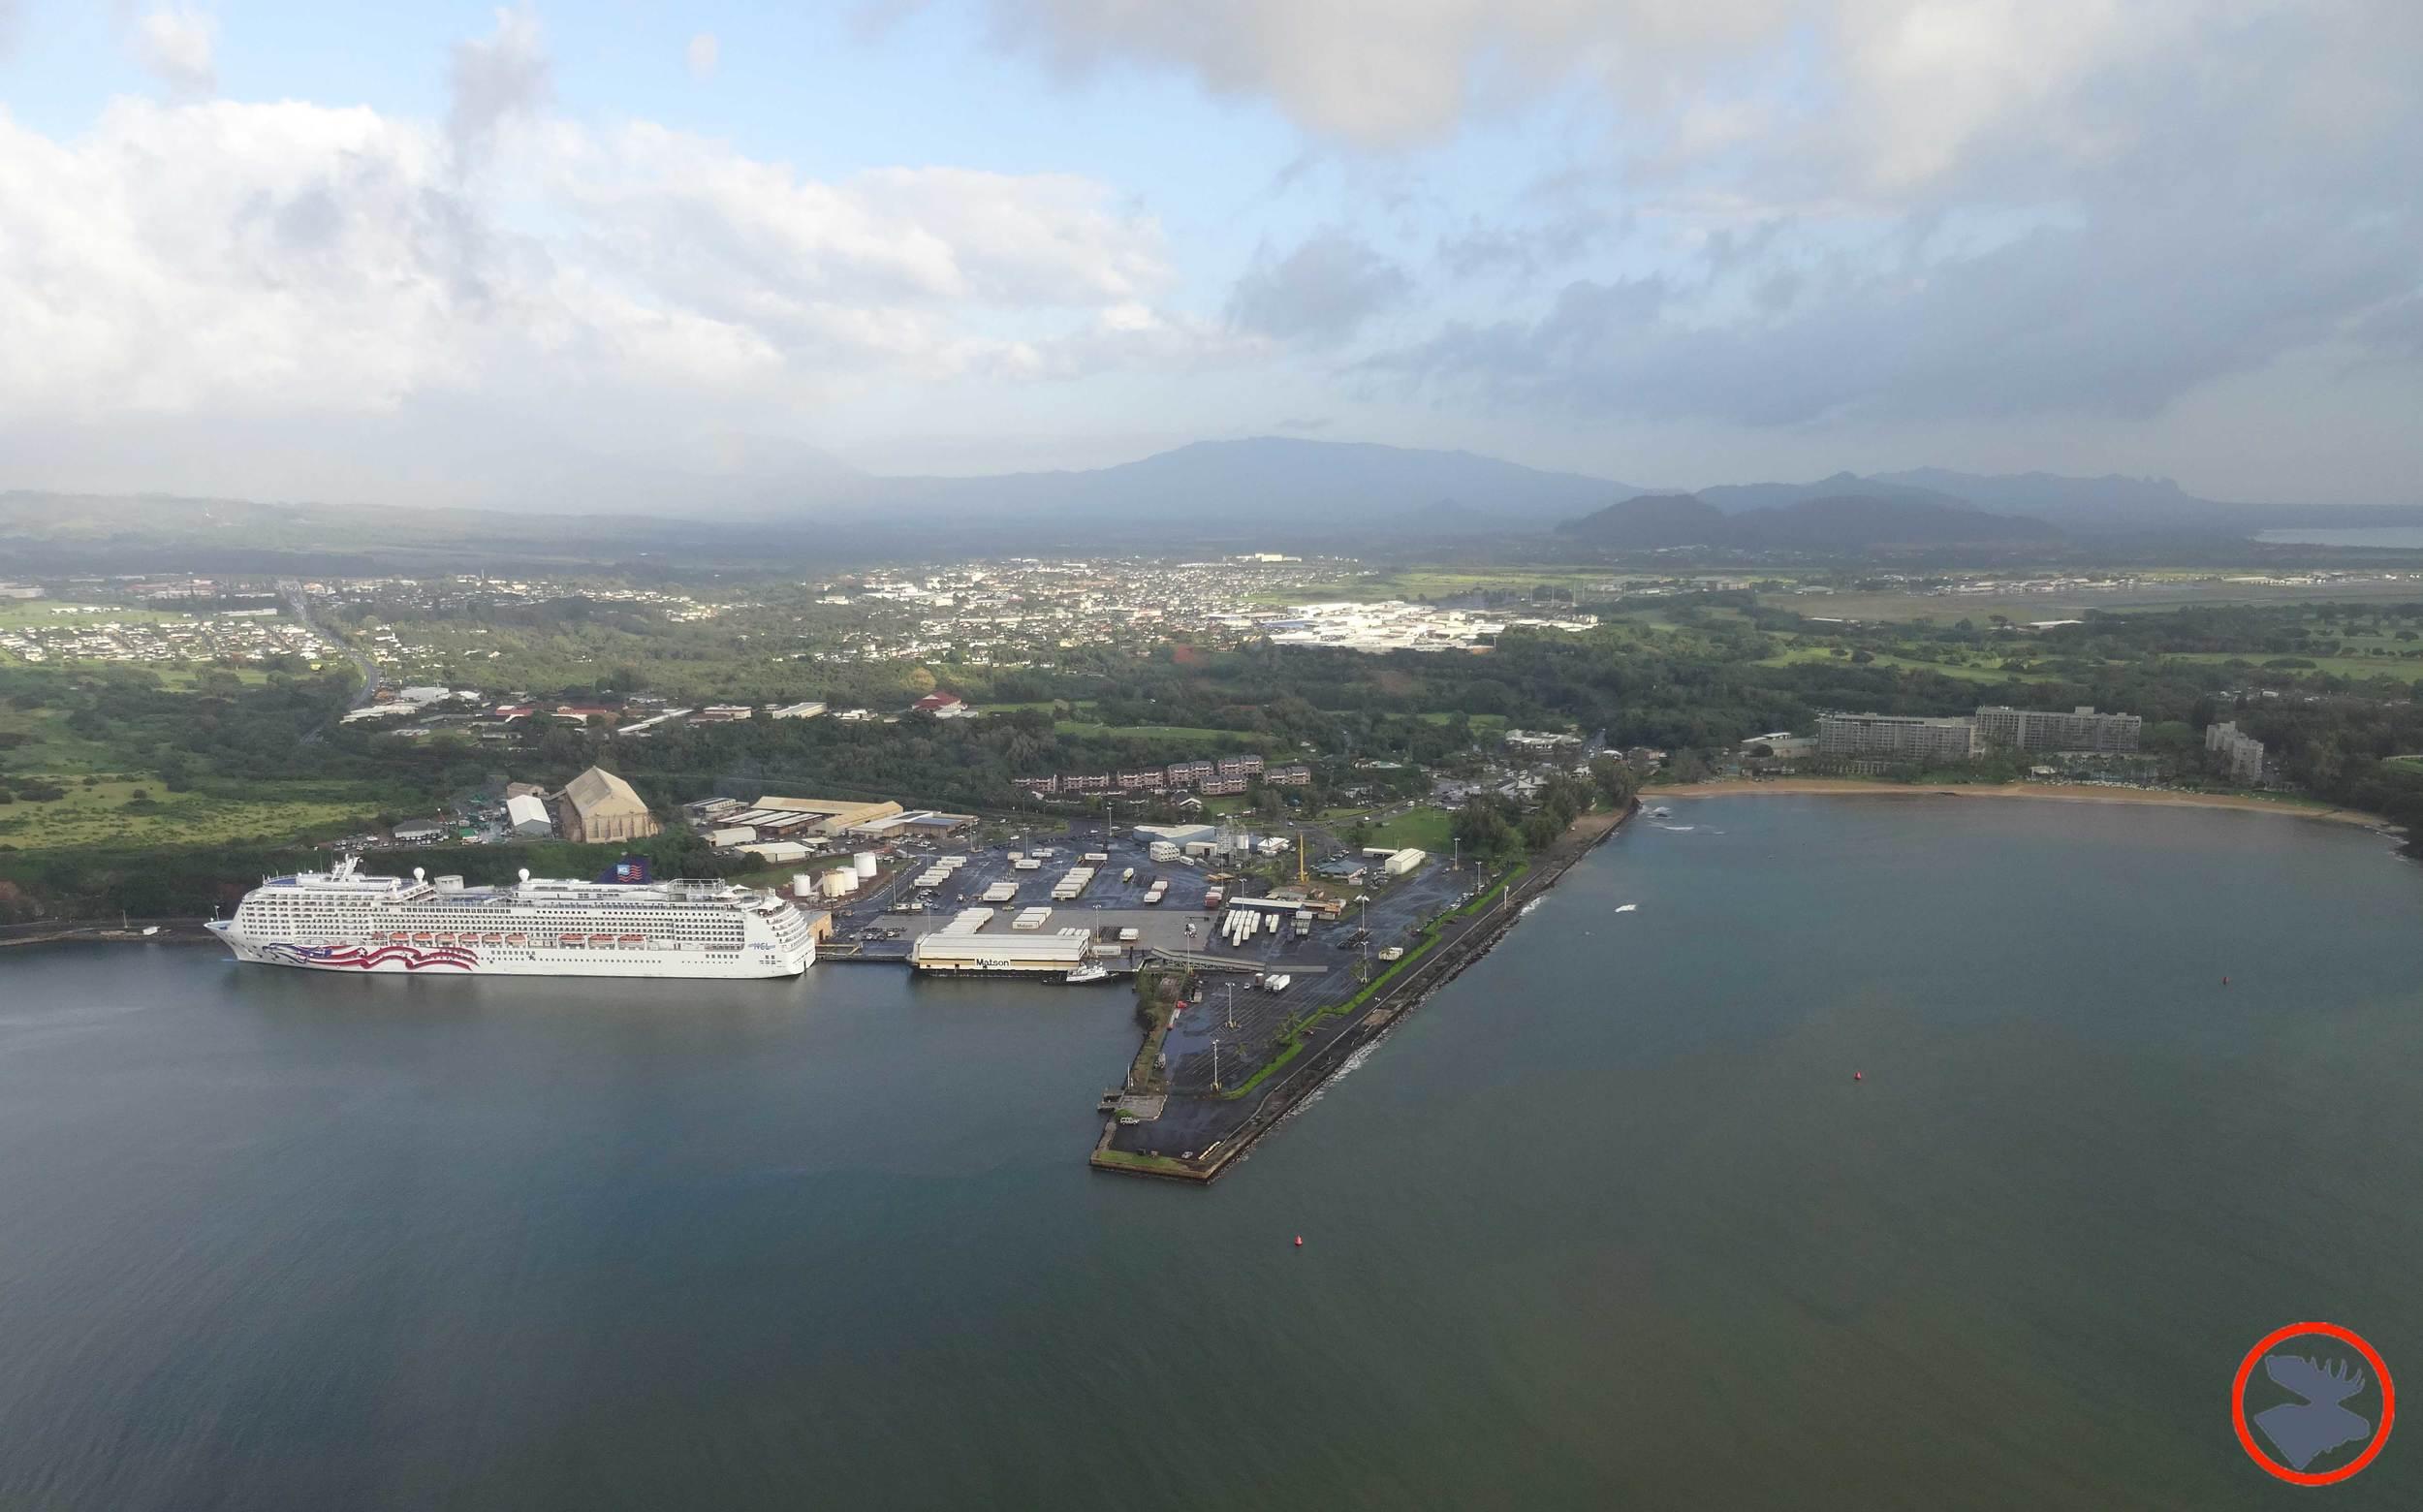 Kauai-View-from-the-Sky.jpg